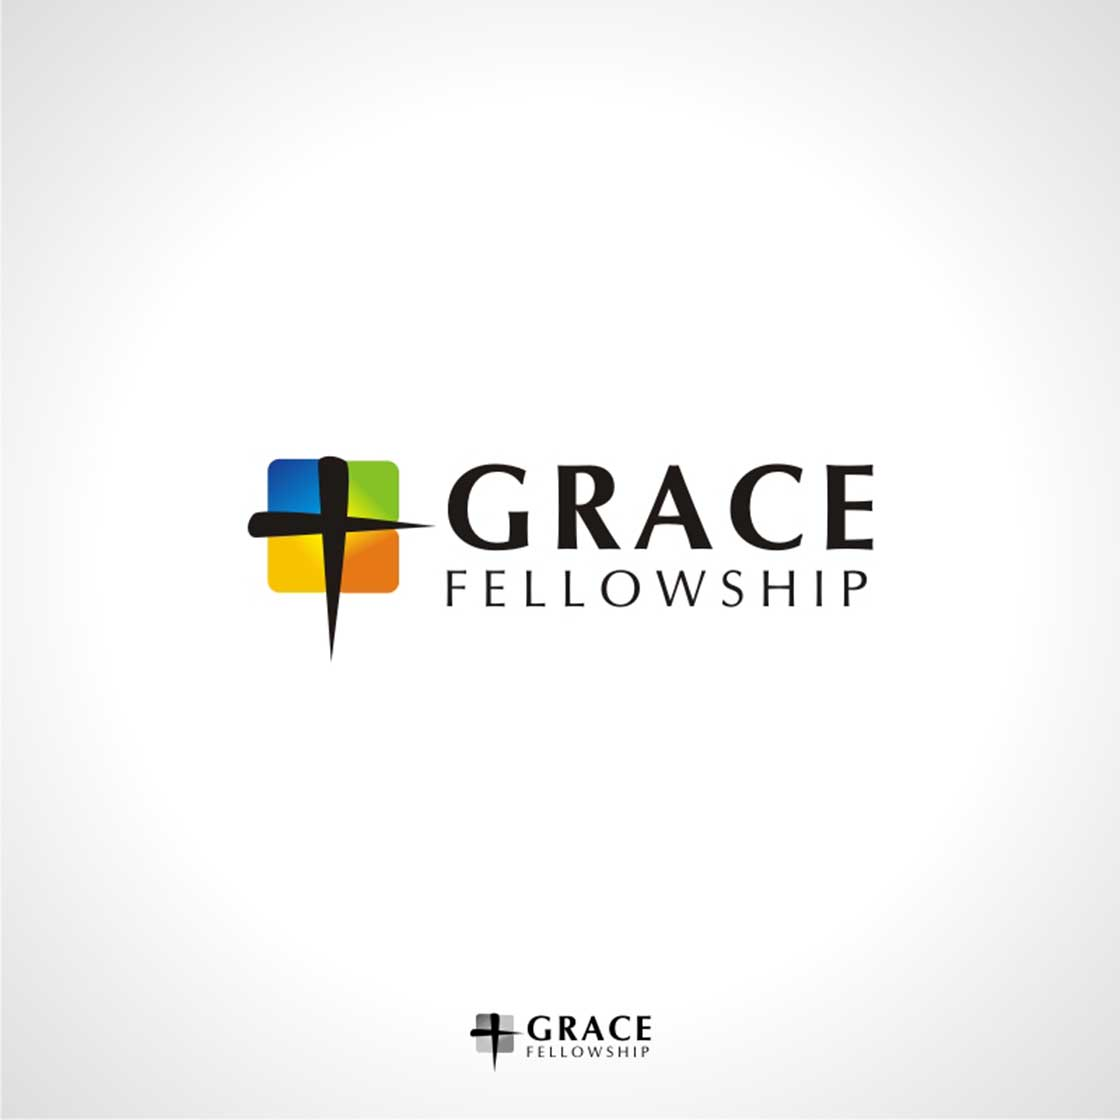 crowdspring church logo design by niteshthapa